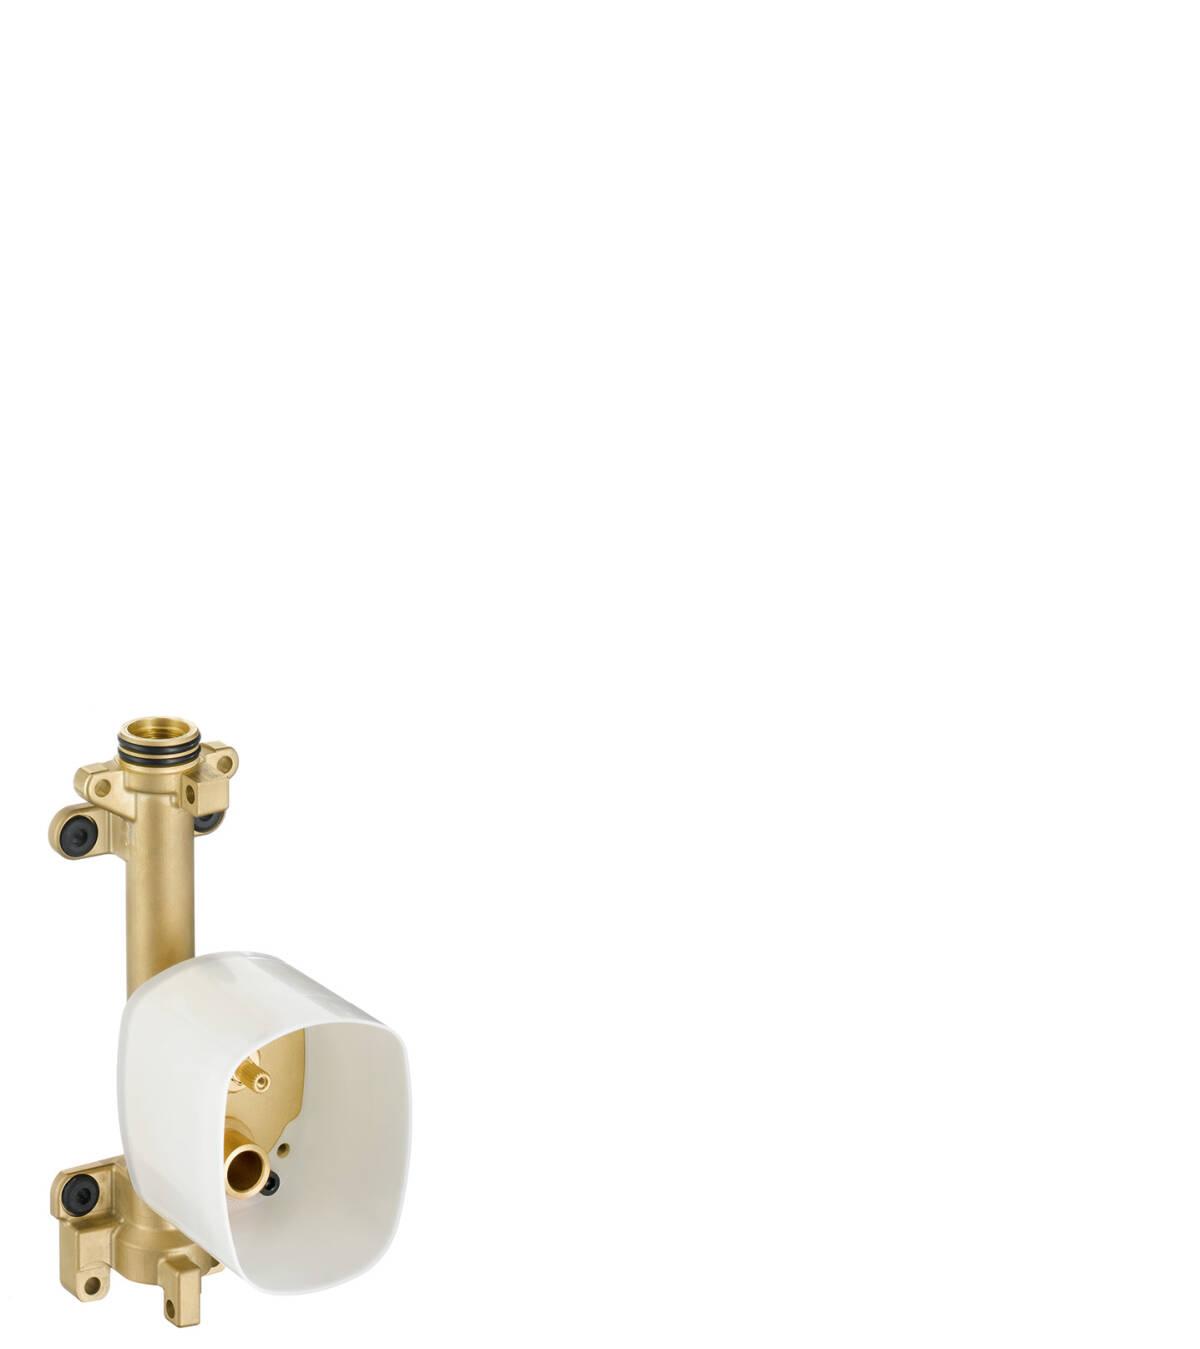 Basic set for hand shower module 120/120 for concealed installation, n.a., 10650181